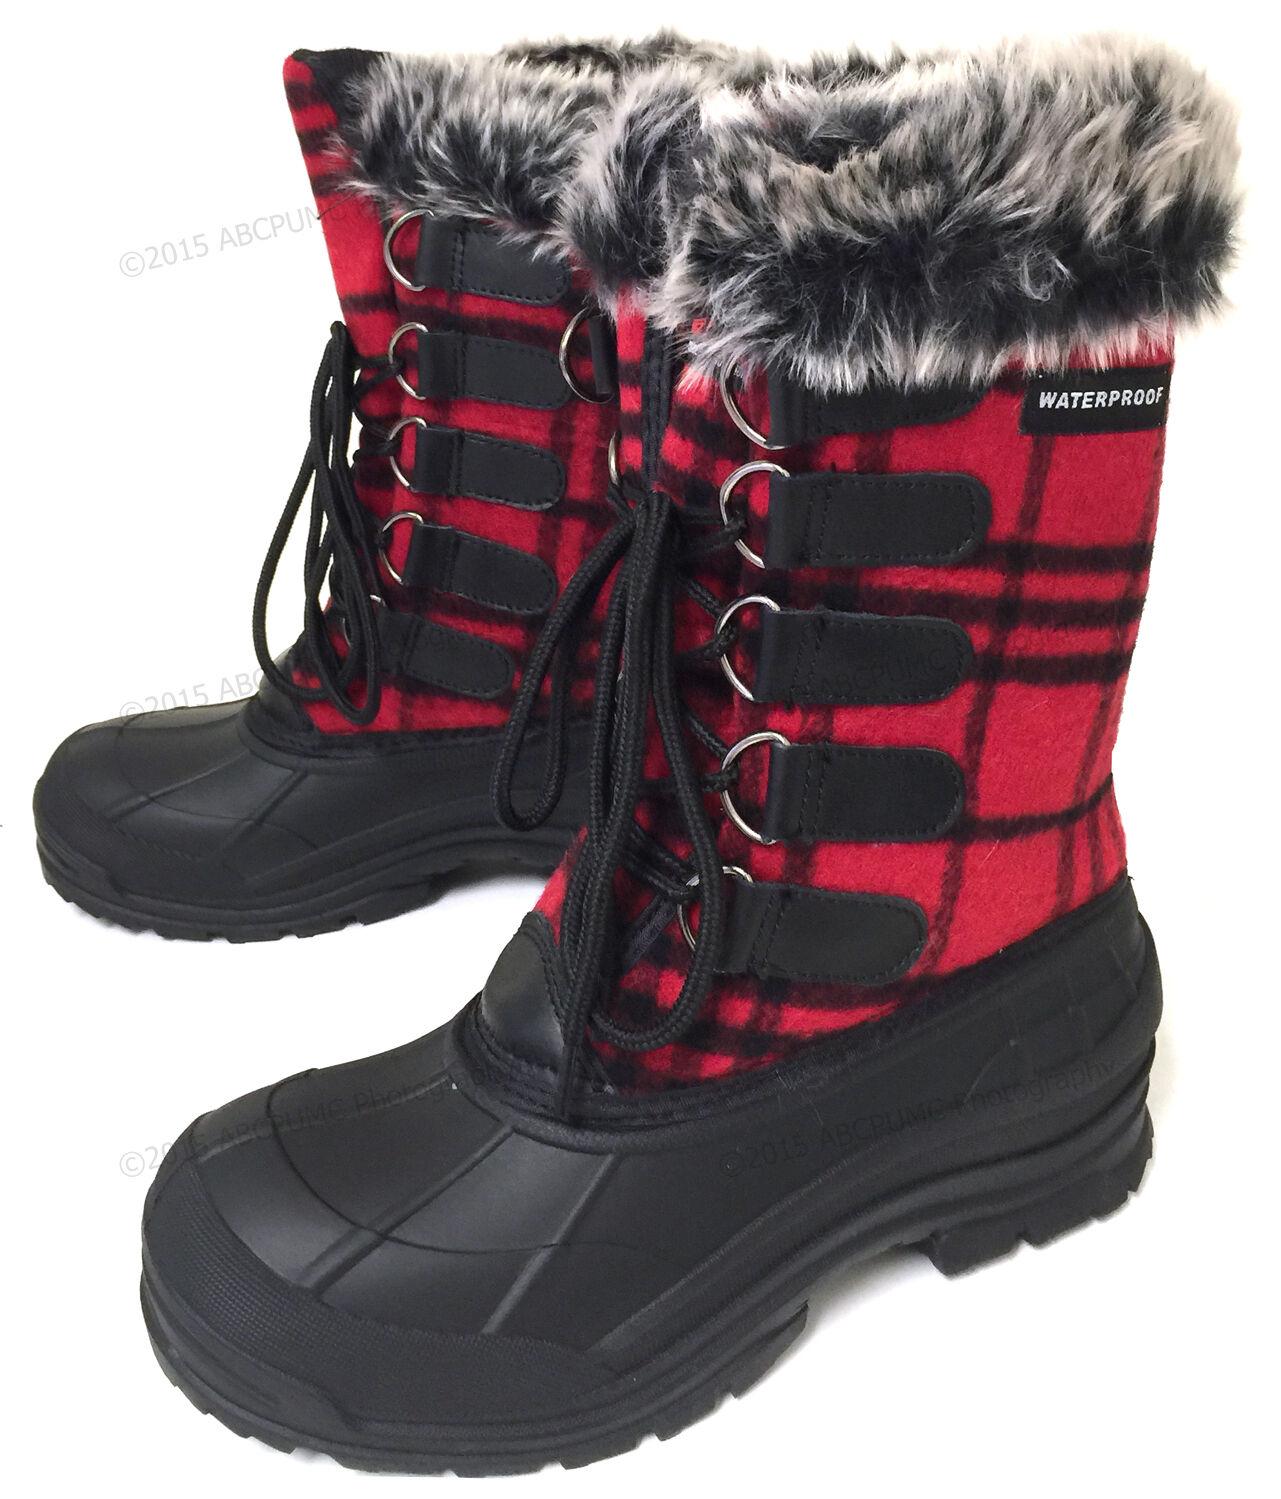 New Women's Winter Boots Flannel Plaid Fur Warm Insulated Wa